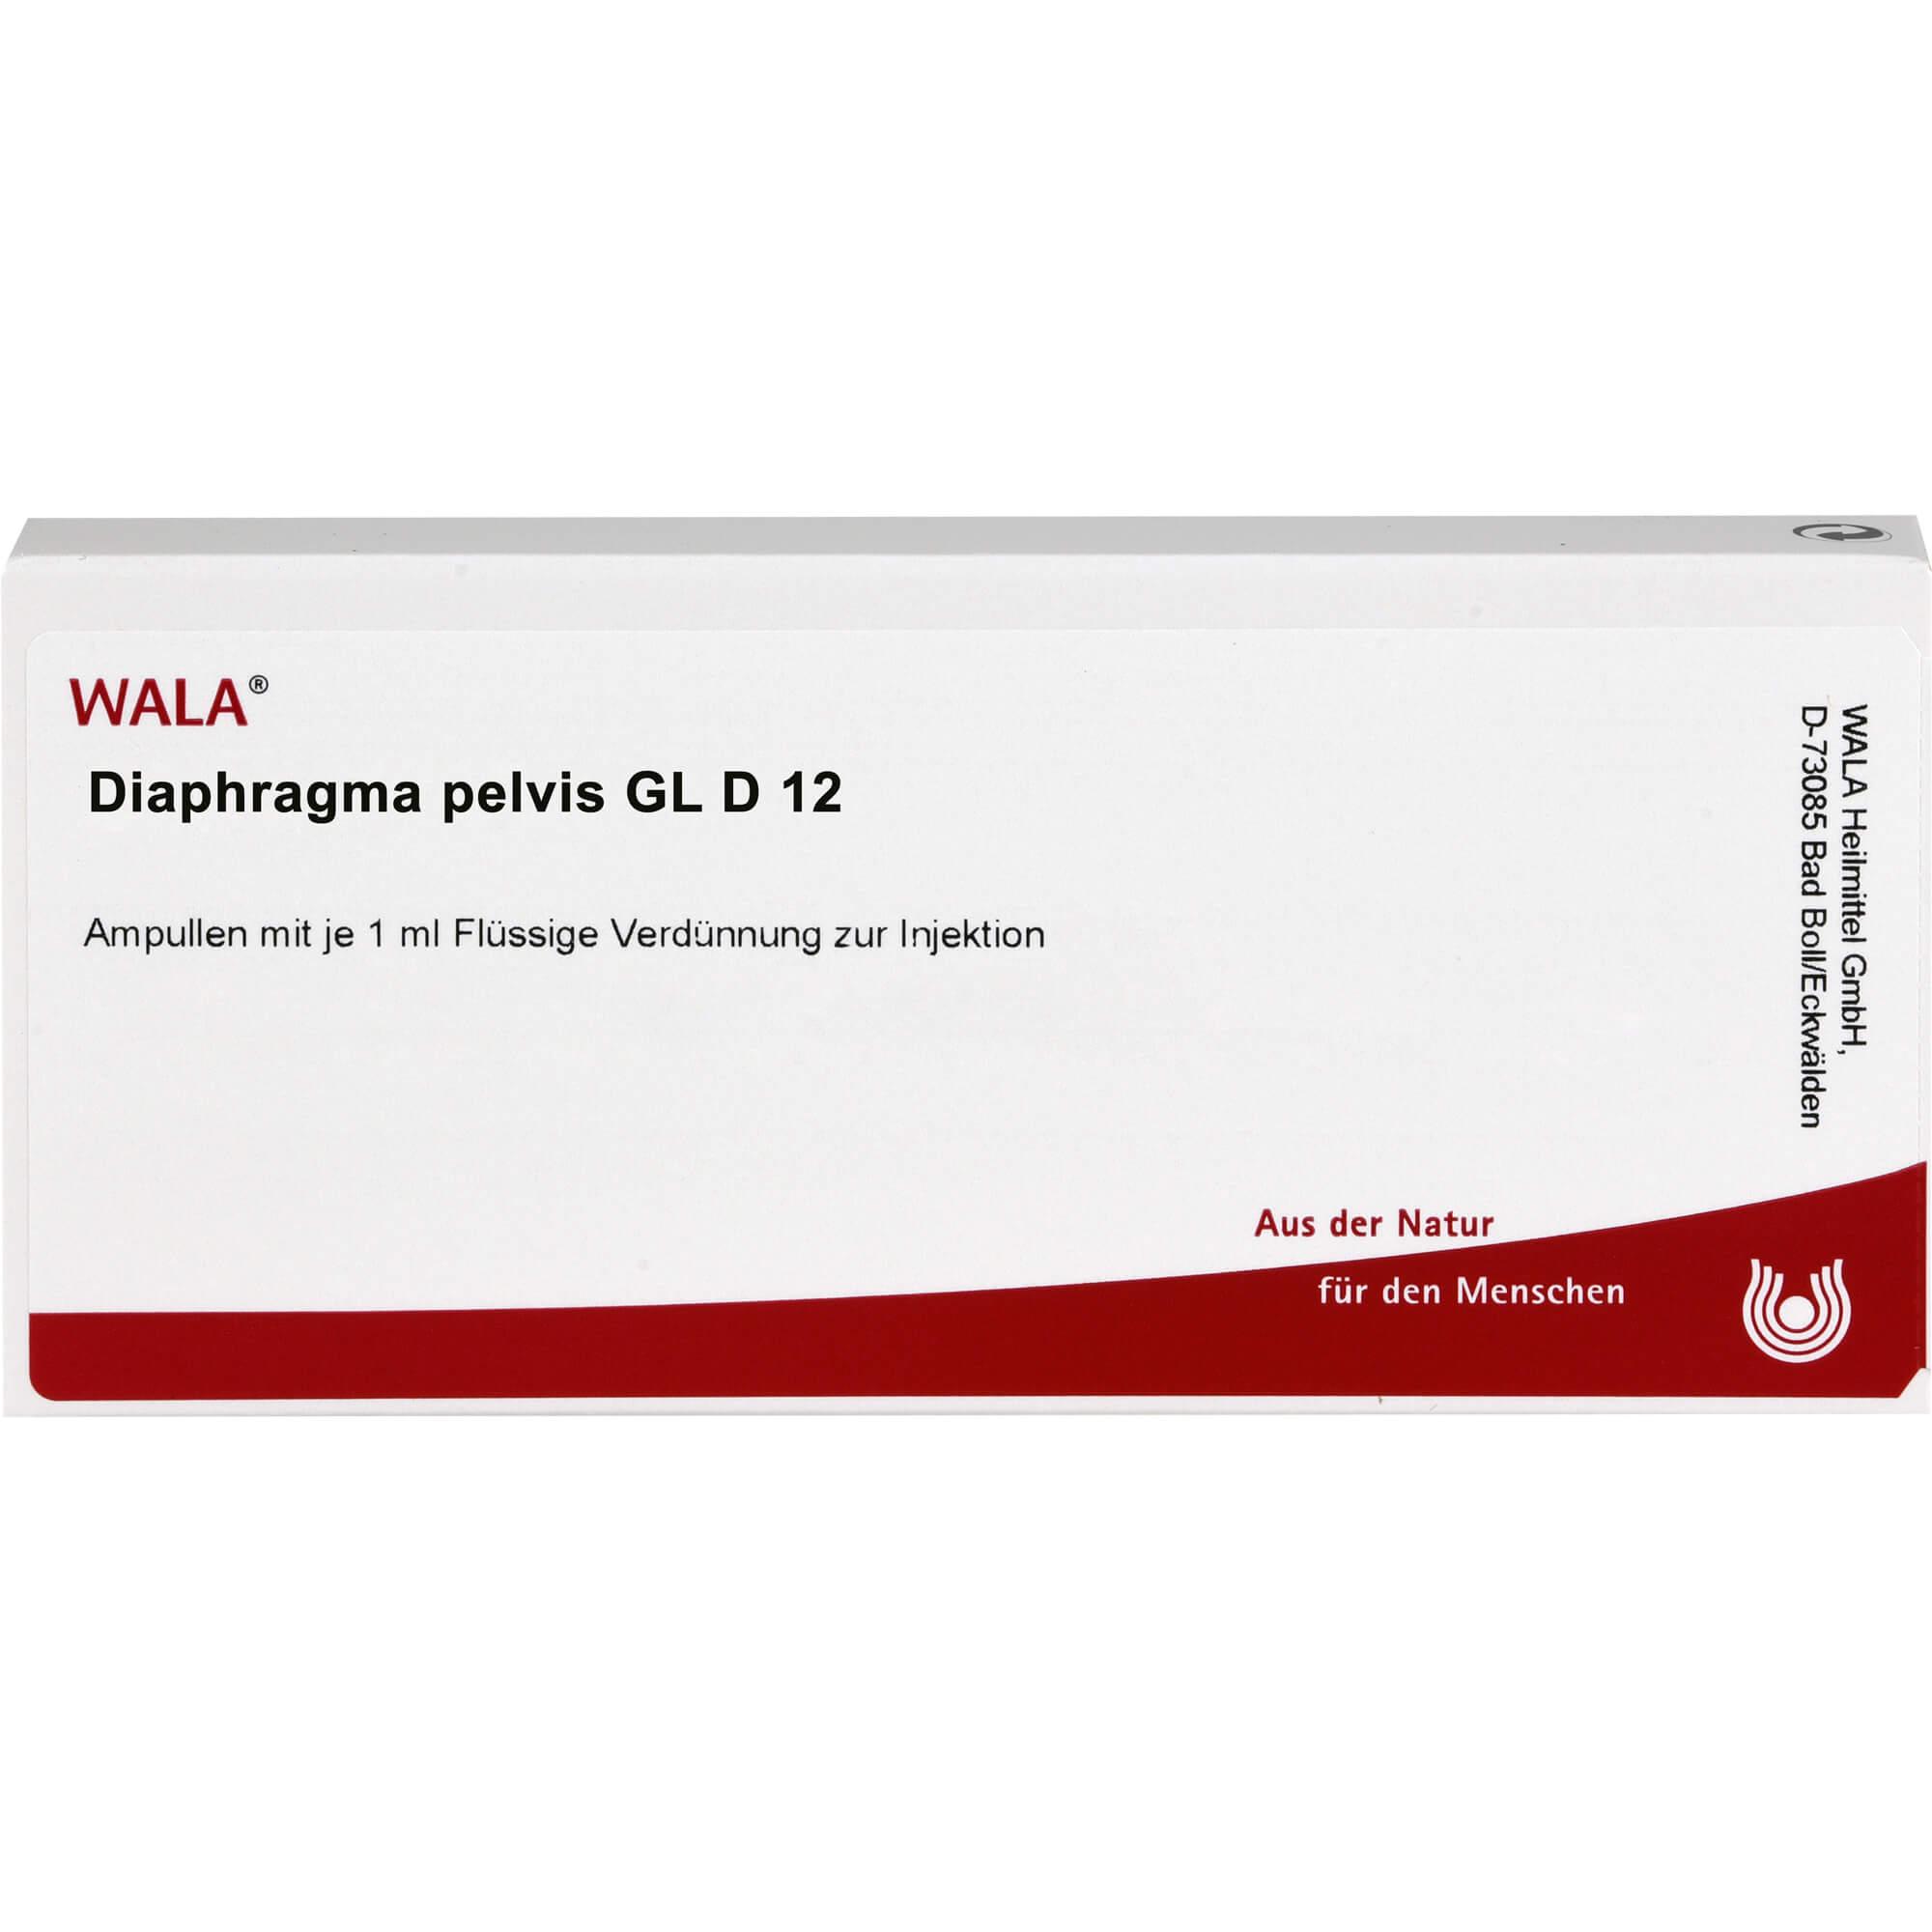 DIAPHRAGMA PELVIS GL D 12 Ampullen